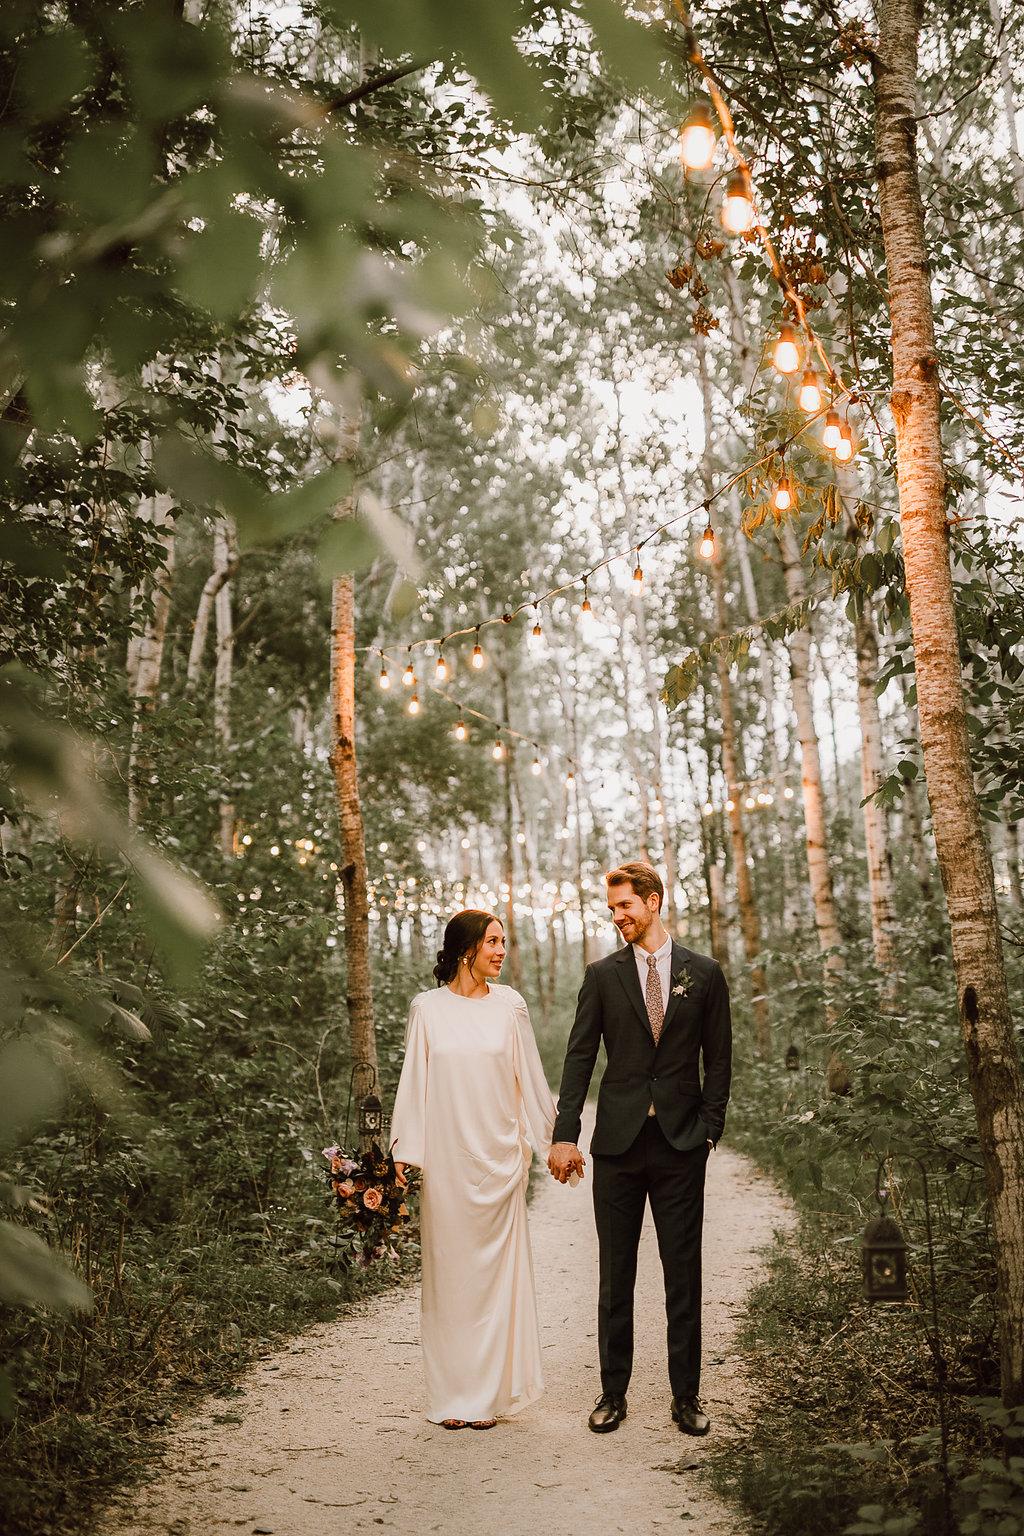 Cielo's Garden Weddings - Wedding Photographers in Winnipeg